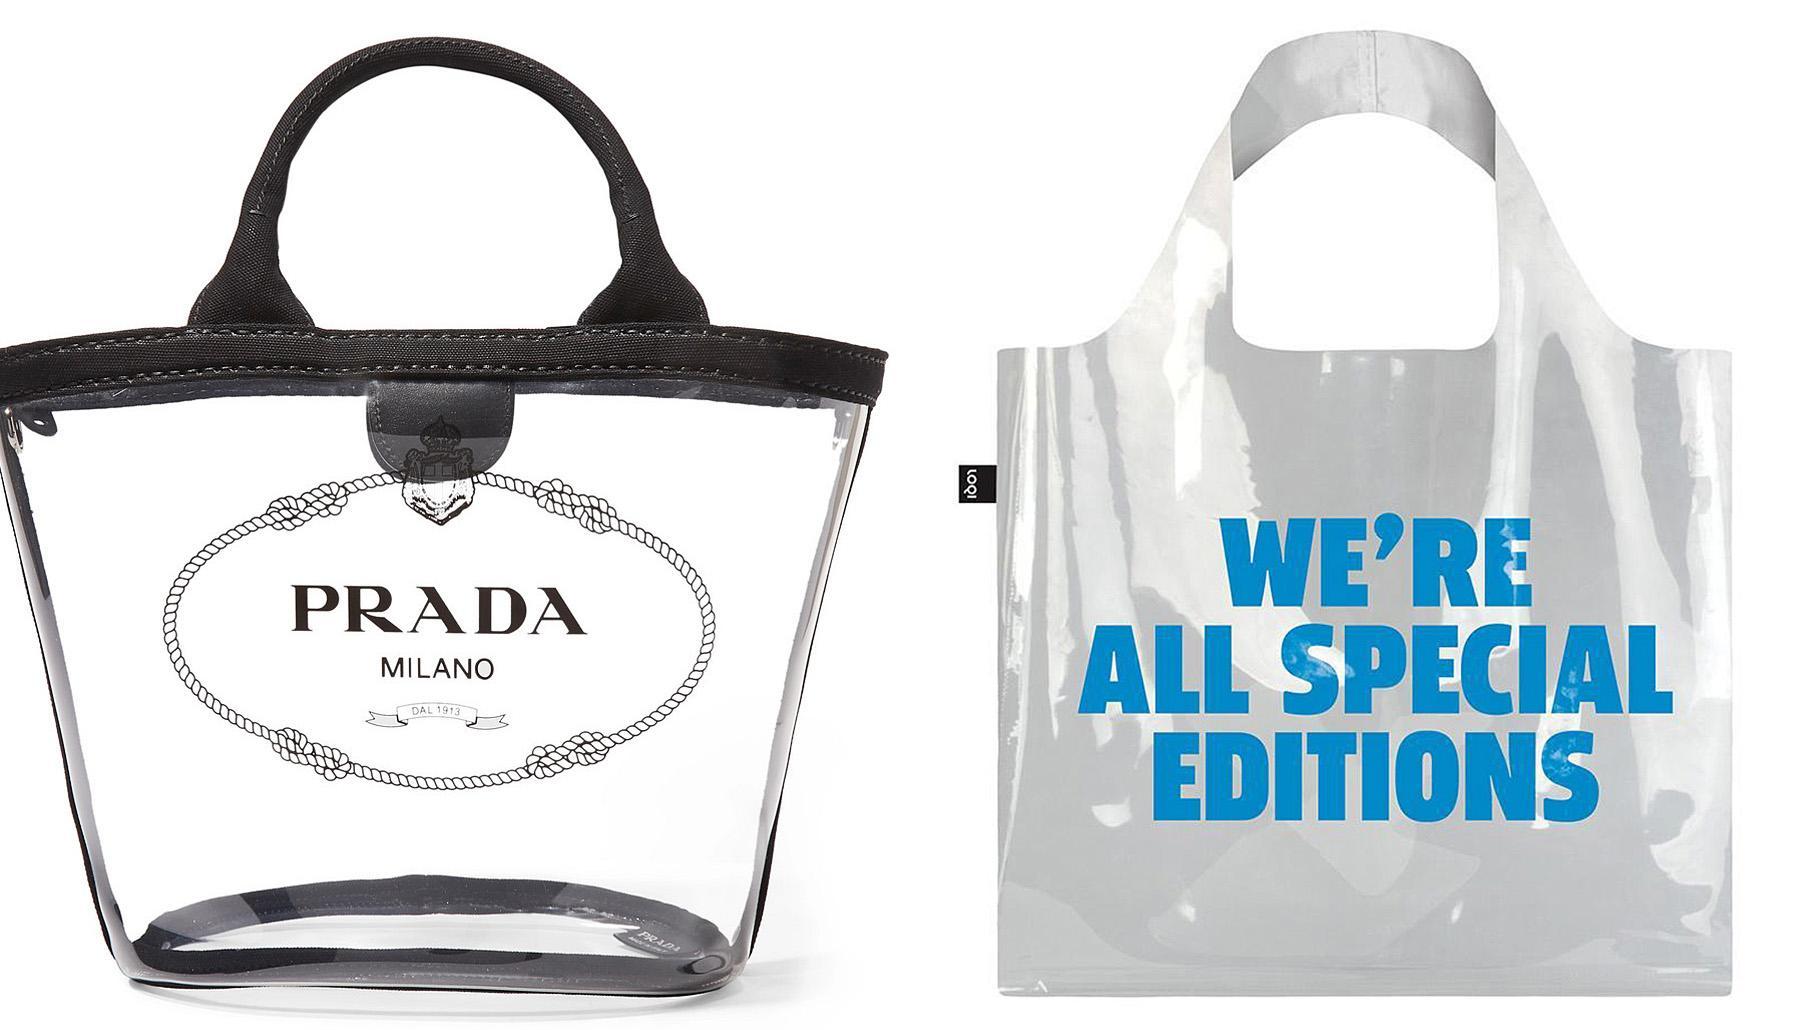 Fashionable transparent bags